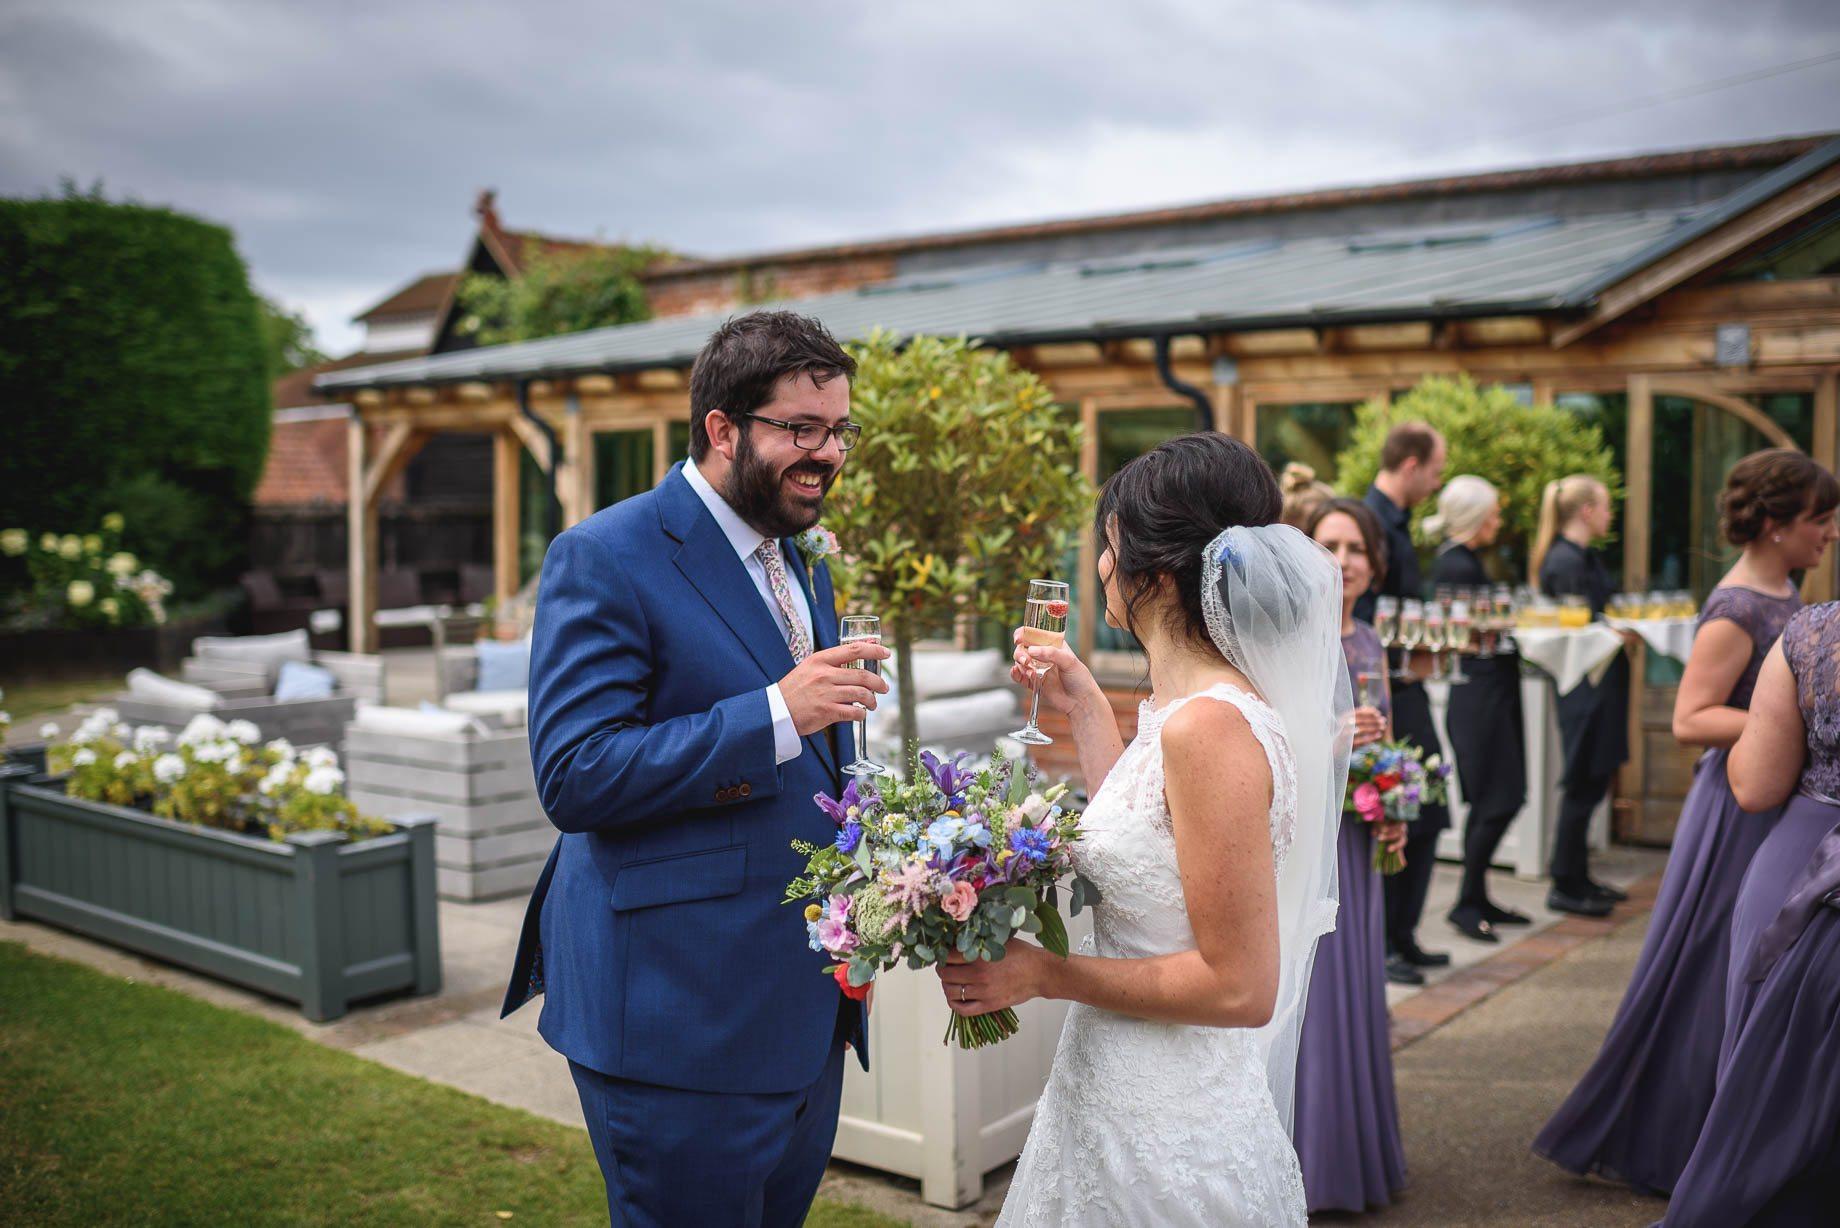 Gaynes Park wedding photography - Guy Collier Photography - Rachel and Jon (75 of 169)